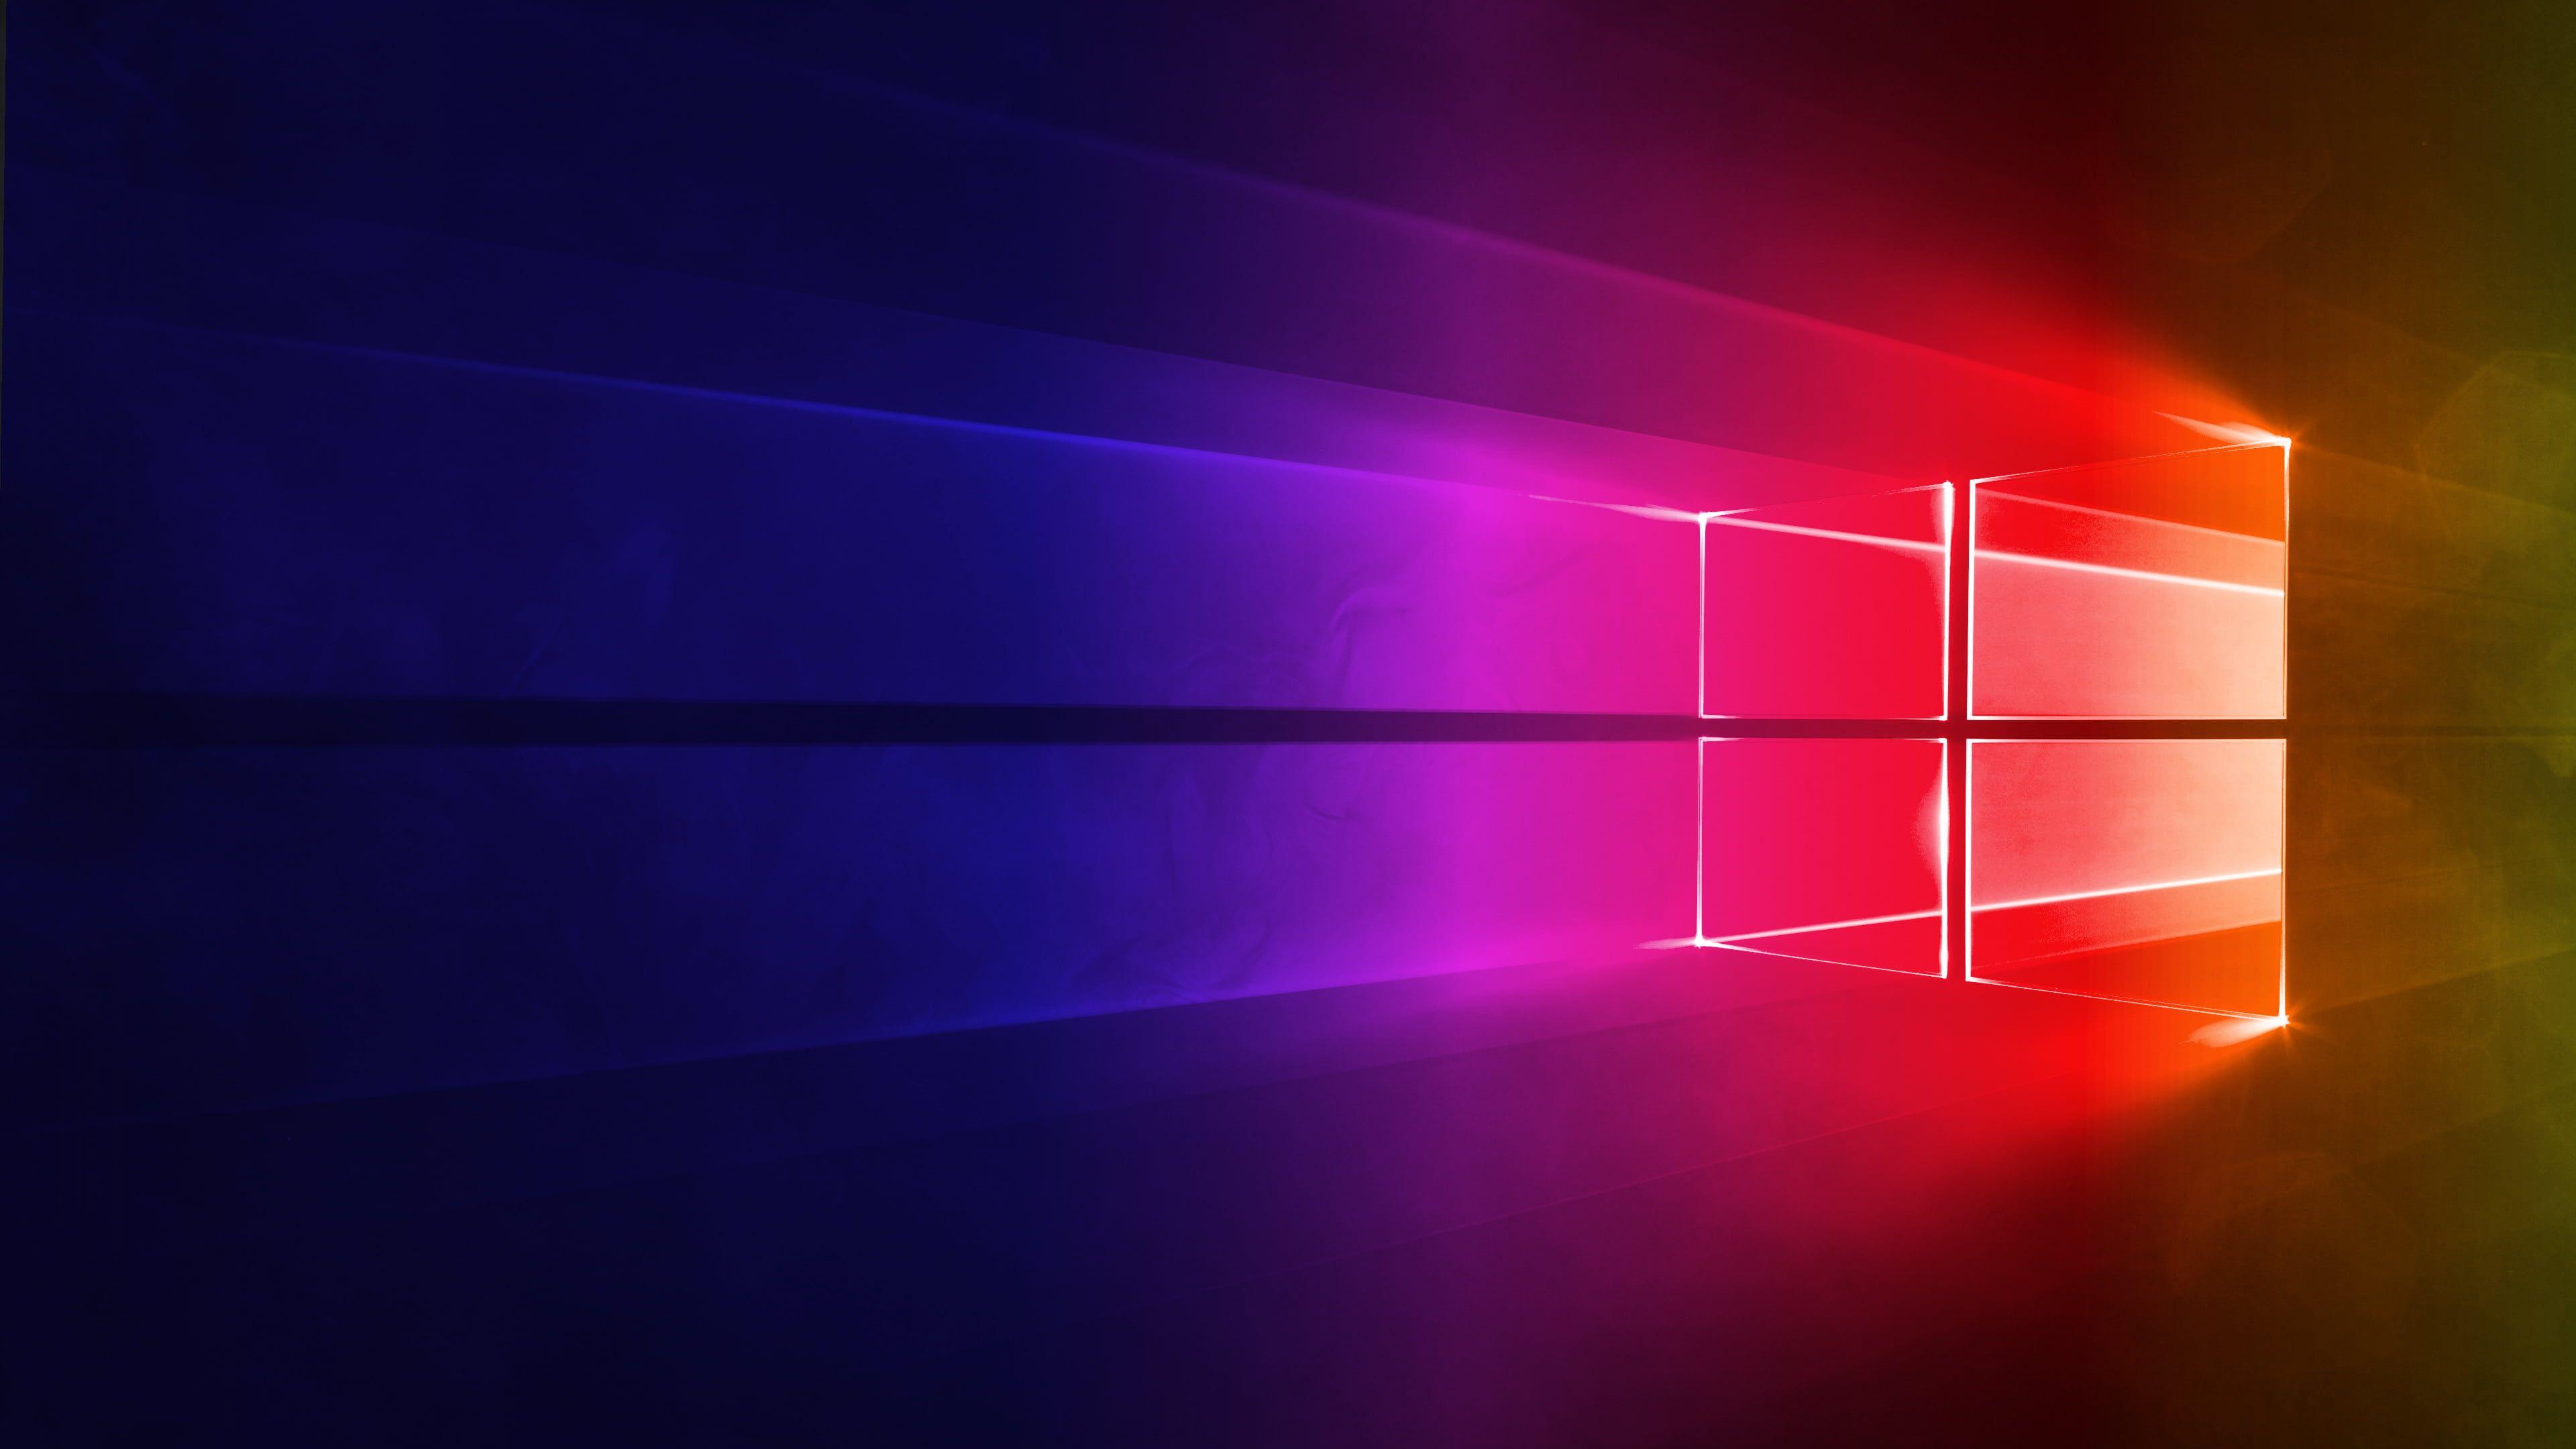 Windows 10 Microsoft Windows Logo 4k Wallpaper Hdwallpaper Desktop In 2021 Windows 10 Wallpaper Windows 10 Microsoft Windows